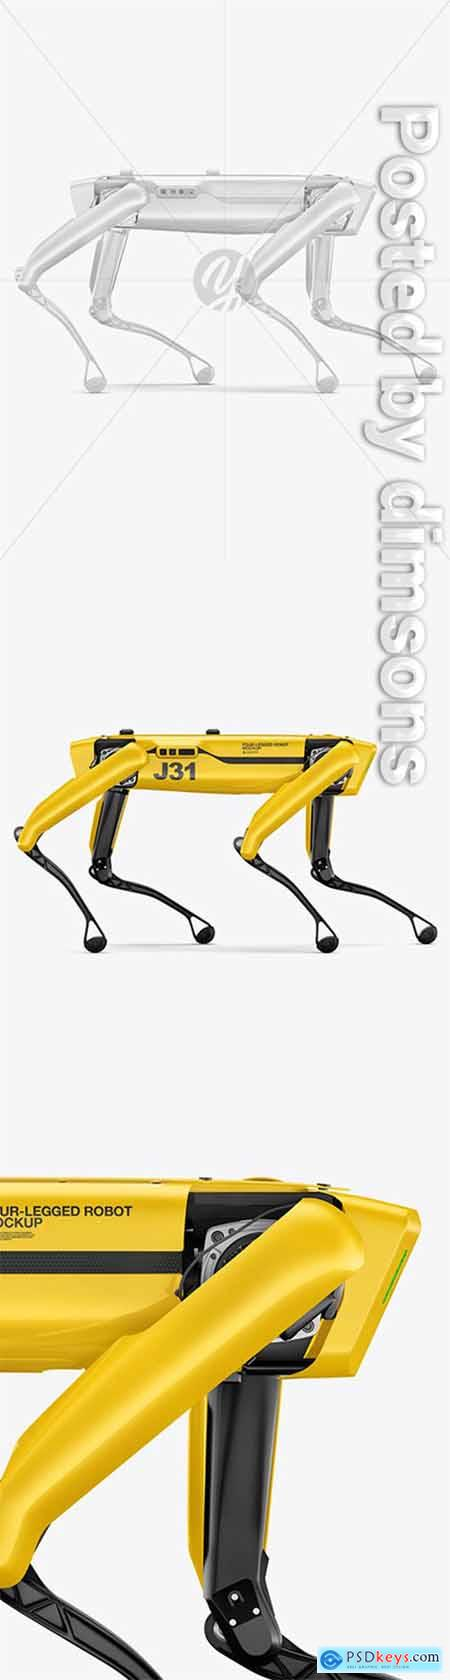 Four-Legged Robot Mockup 66142